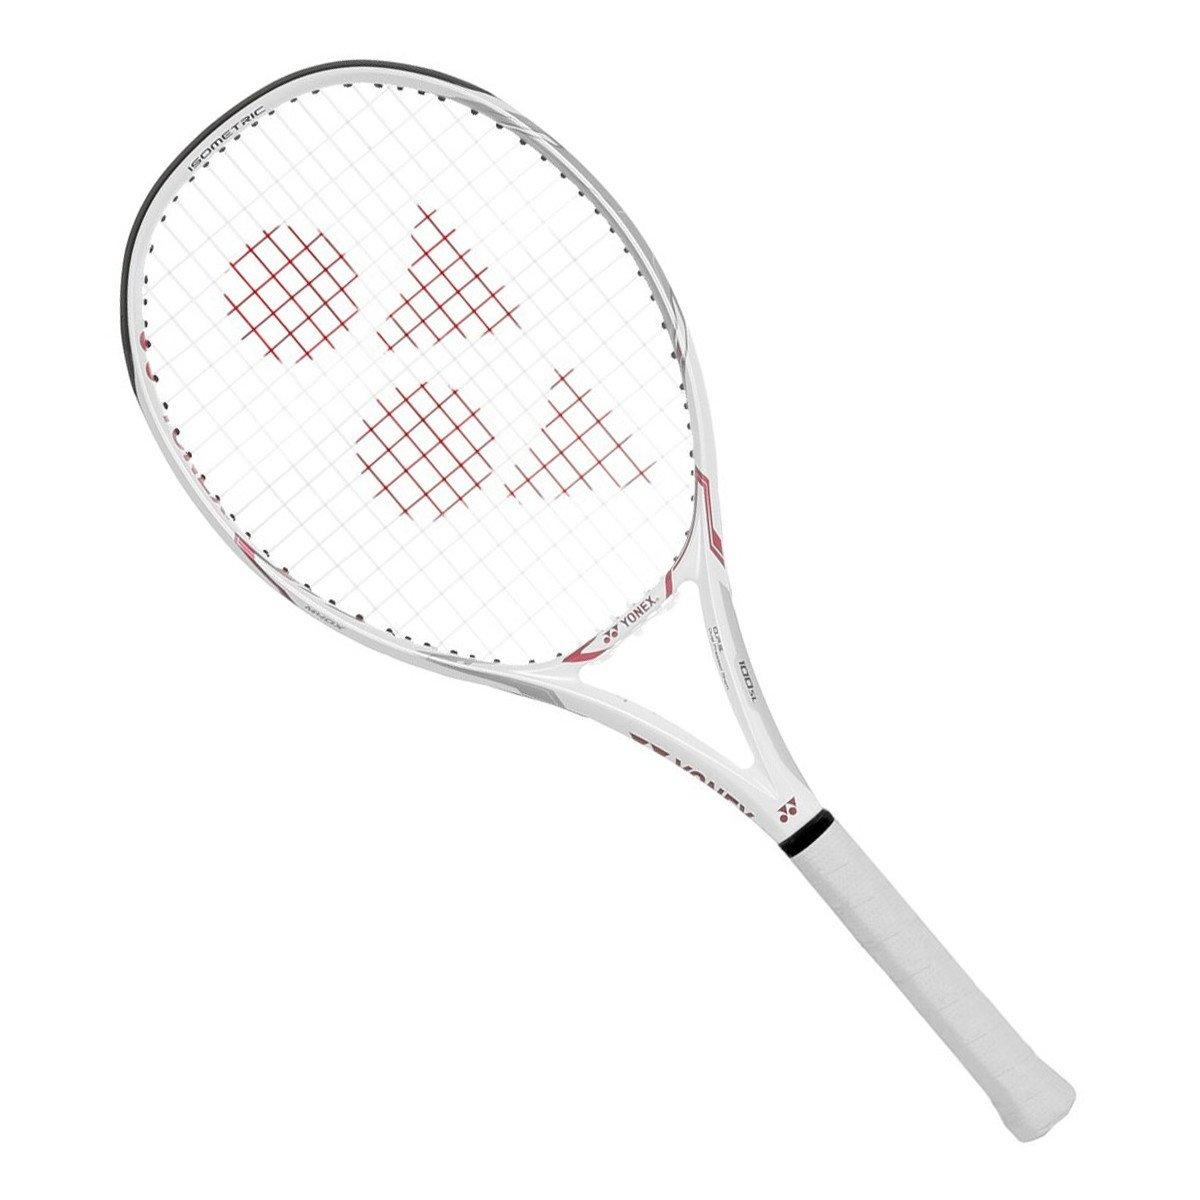 Raquete de Tenis Yonex Ezone 100 SL 270g Empunhadura:L2